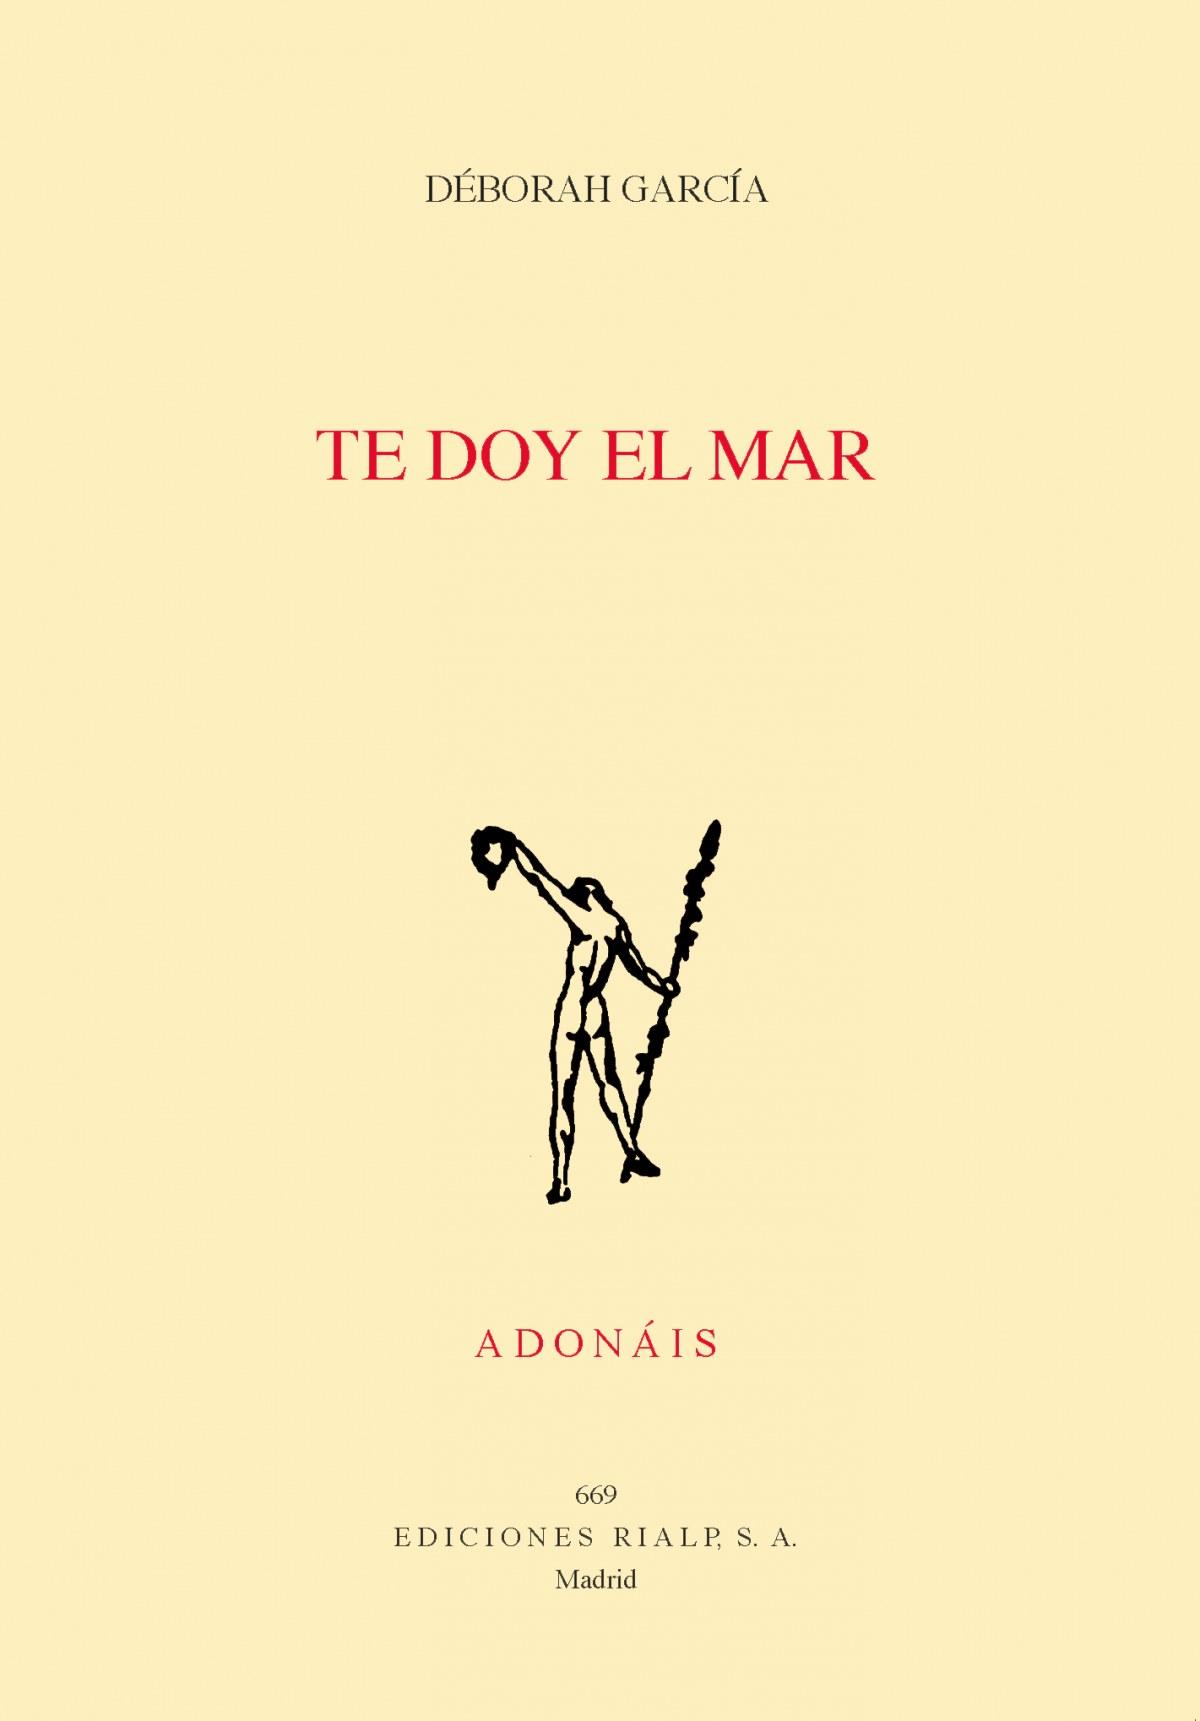 TE DOY EL MAR